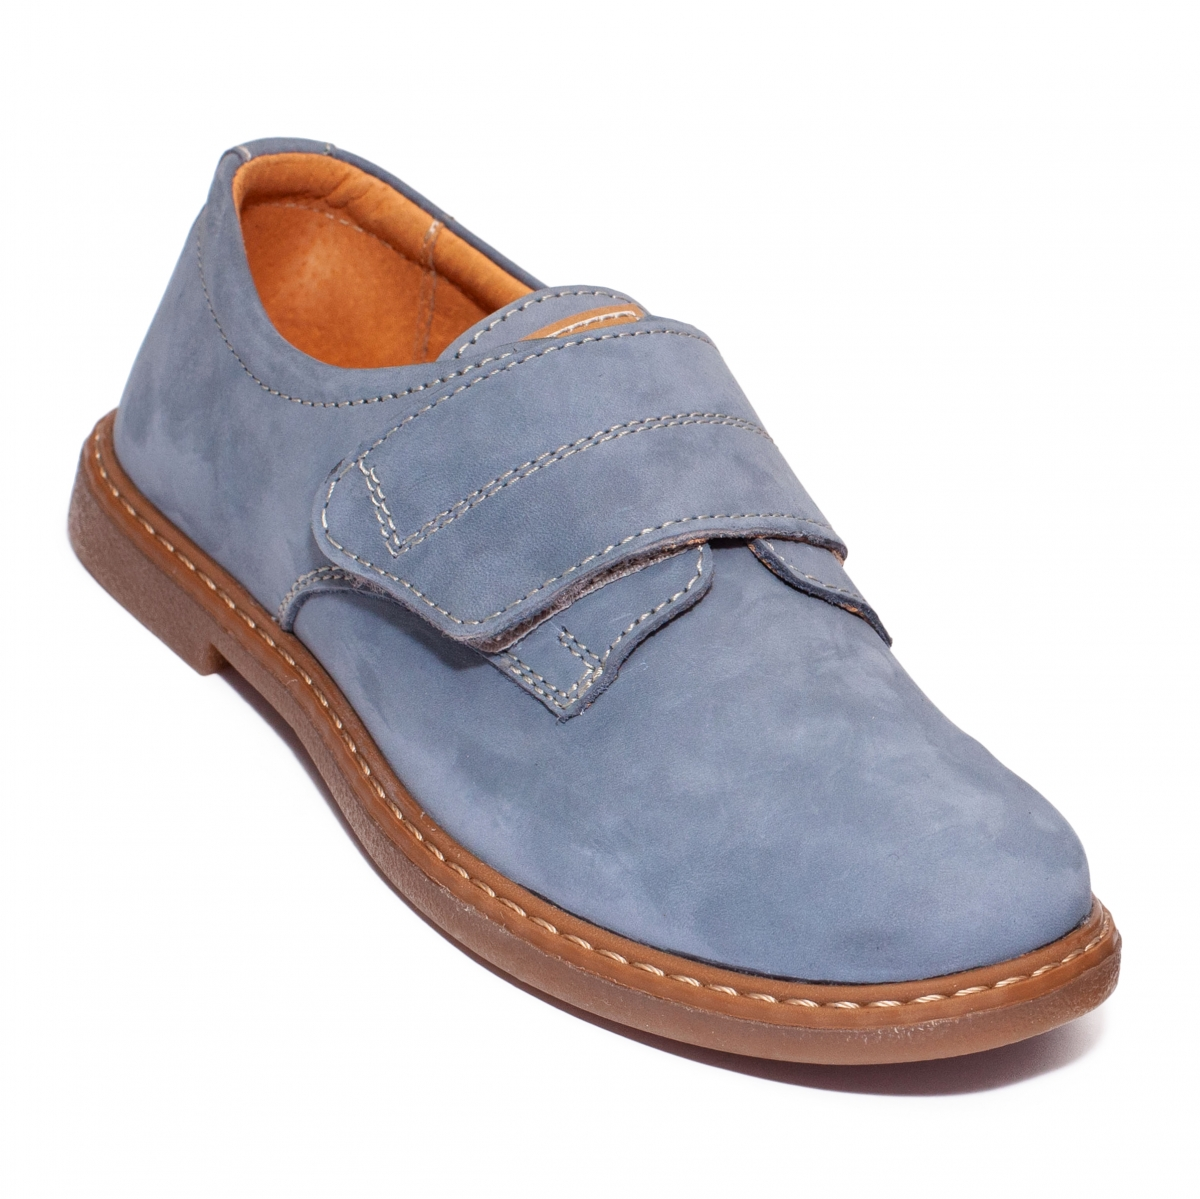 Pantofi copii scoala piele Denis Blue 24-36